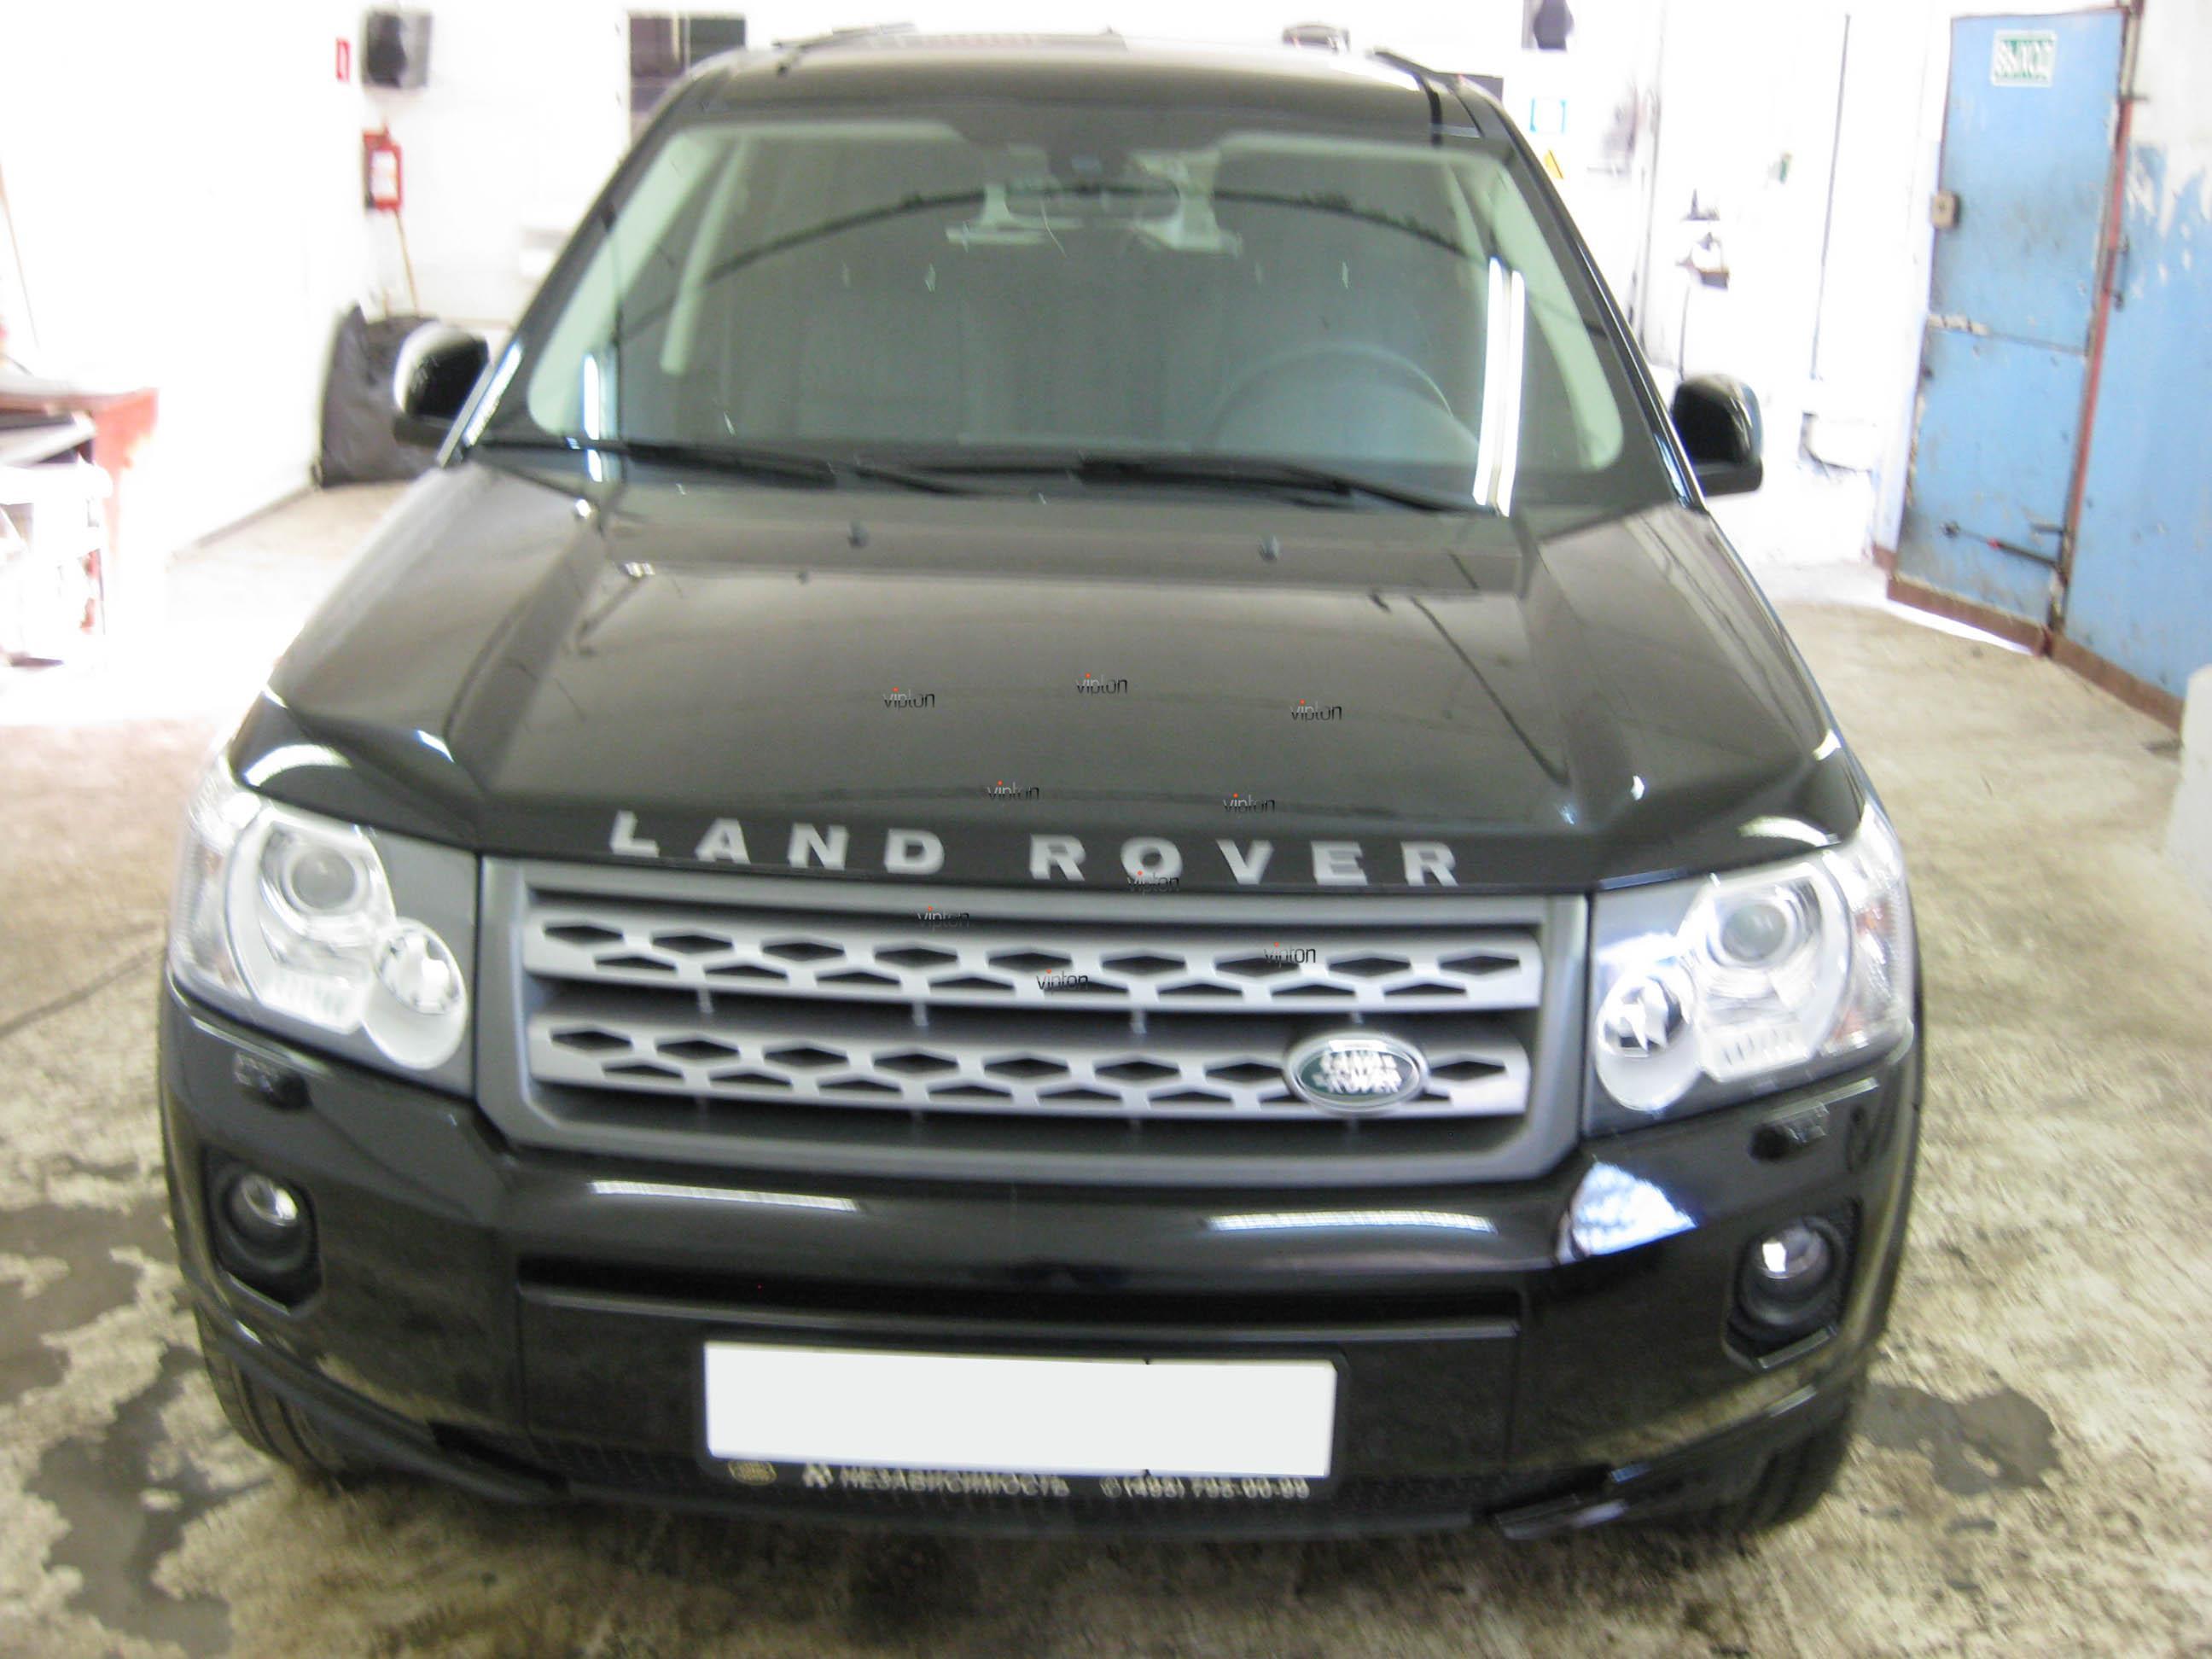 Автомобиль Land Rover Freelander: антигравий